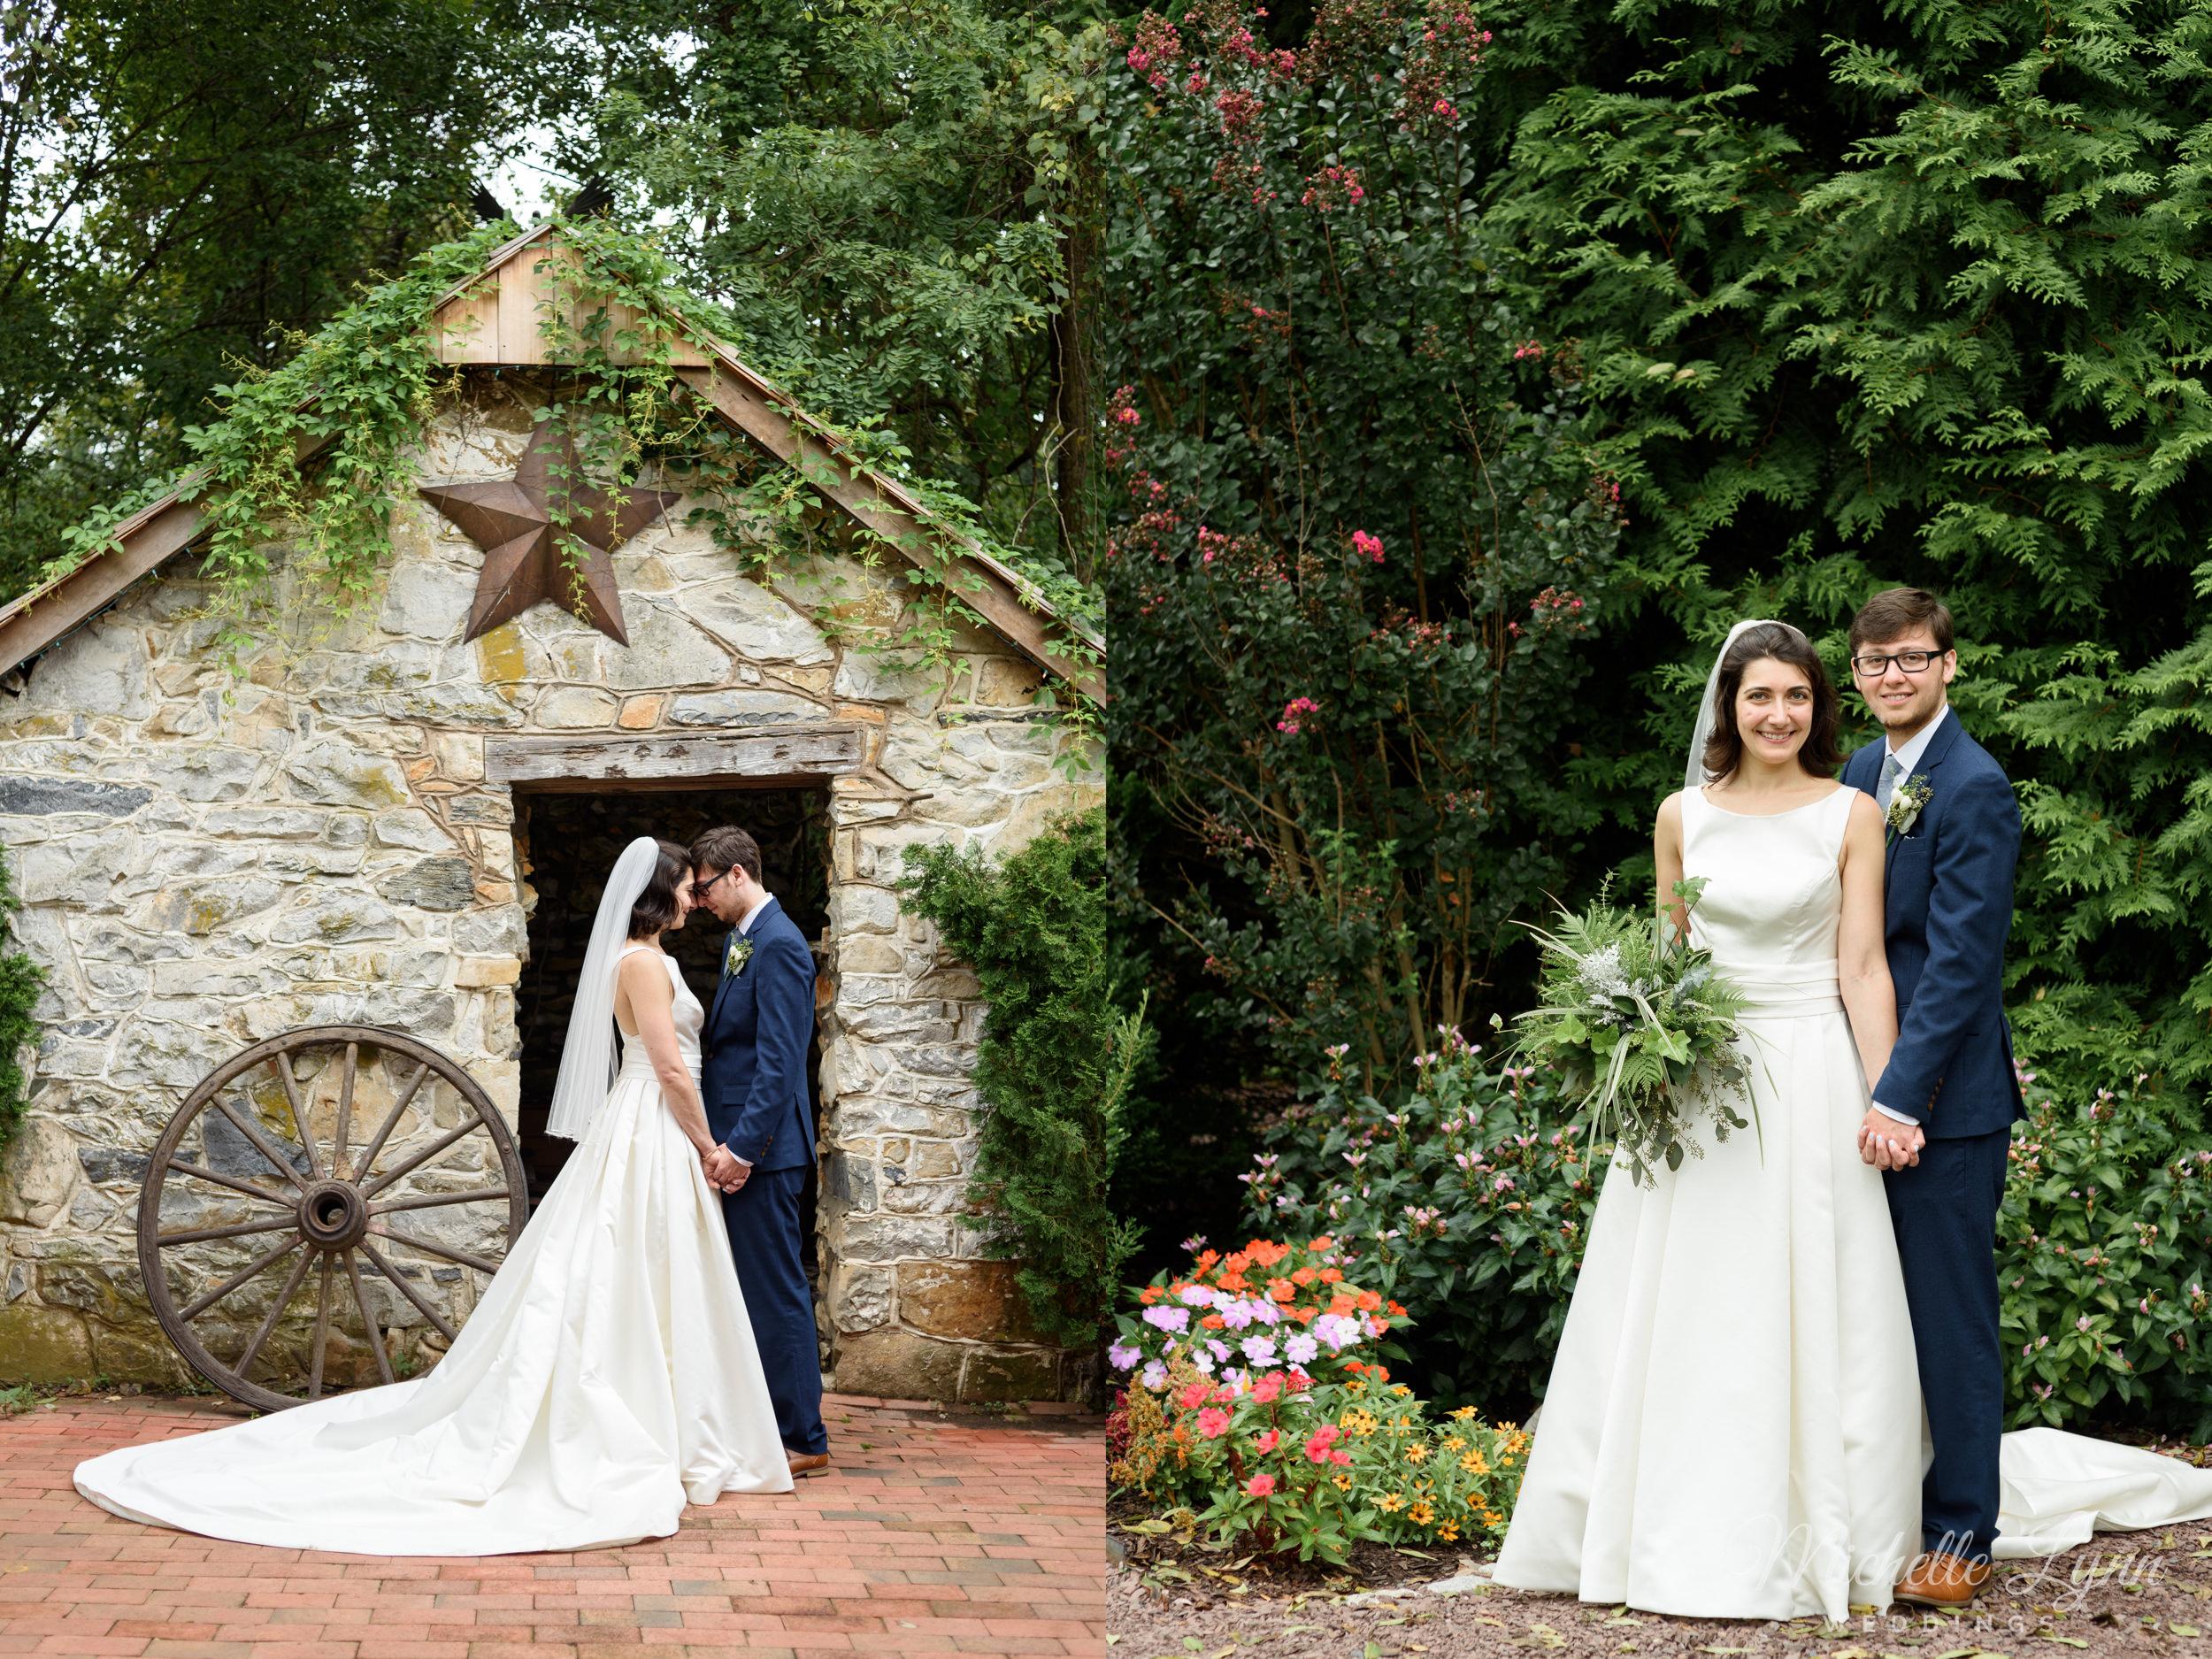 mlw-general-warren-malvern-wedding-photographer-28.jpg